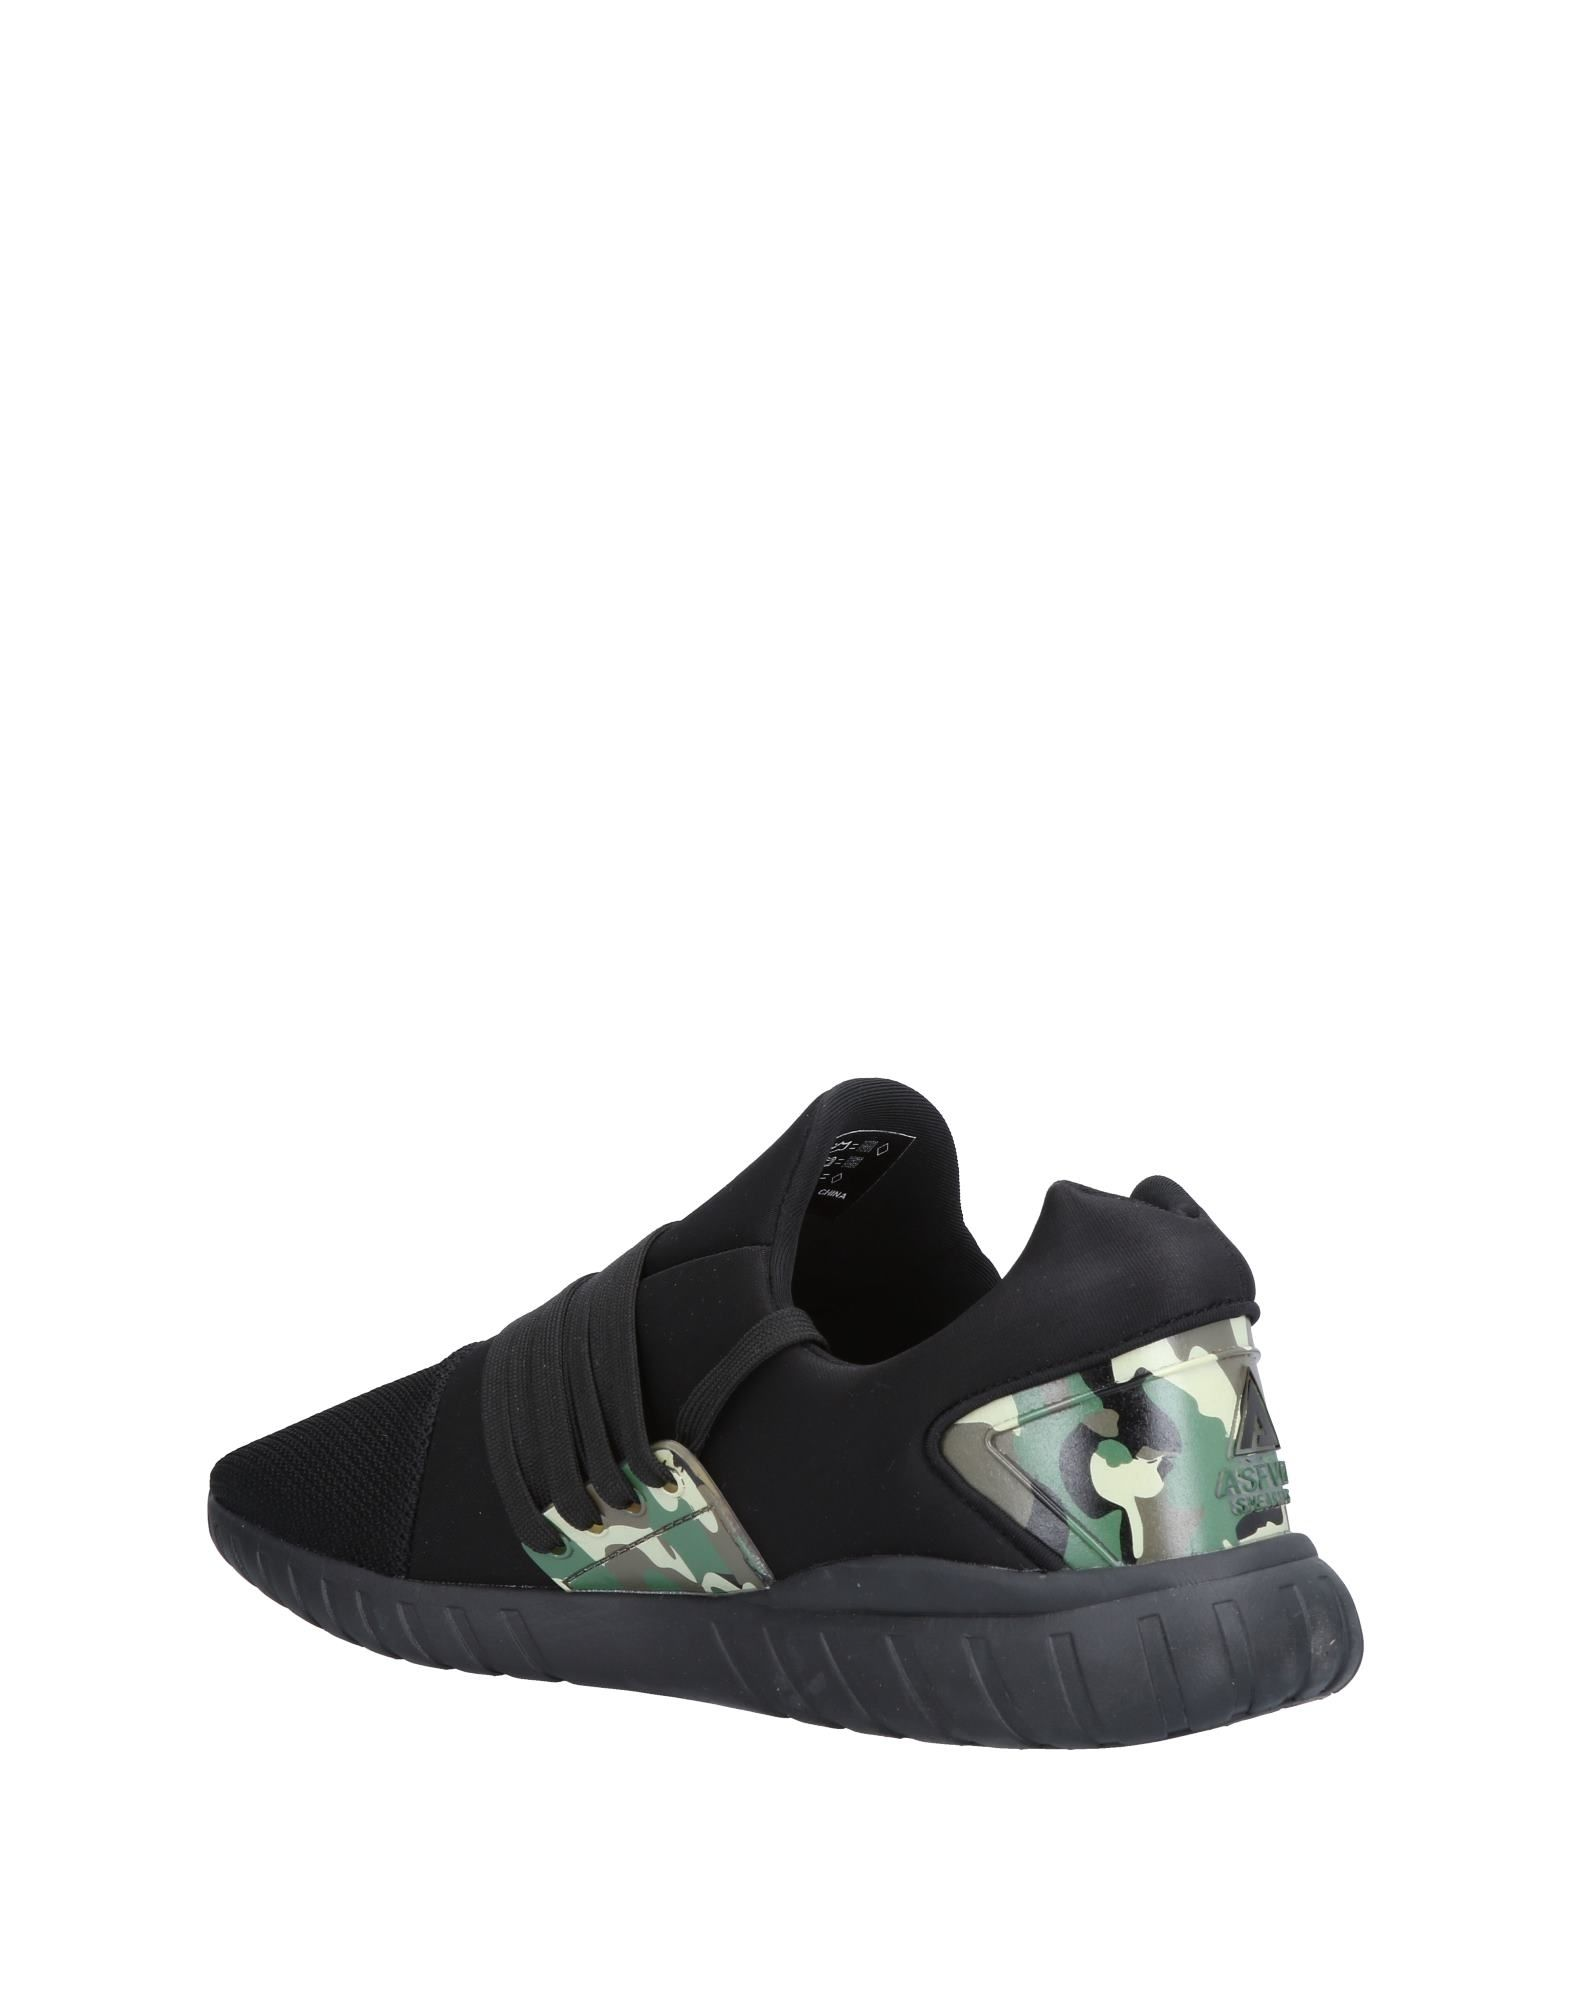 11491084HM Asfvlt Sneakers Herren  11491084HM  Heiße Schuhe 2cfd7c